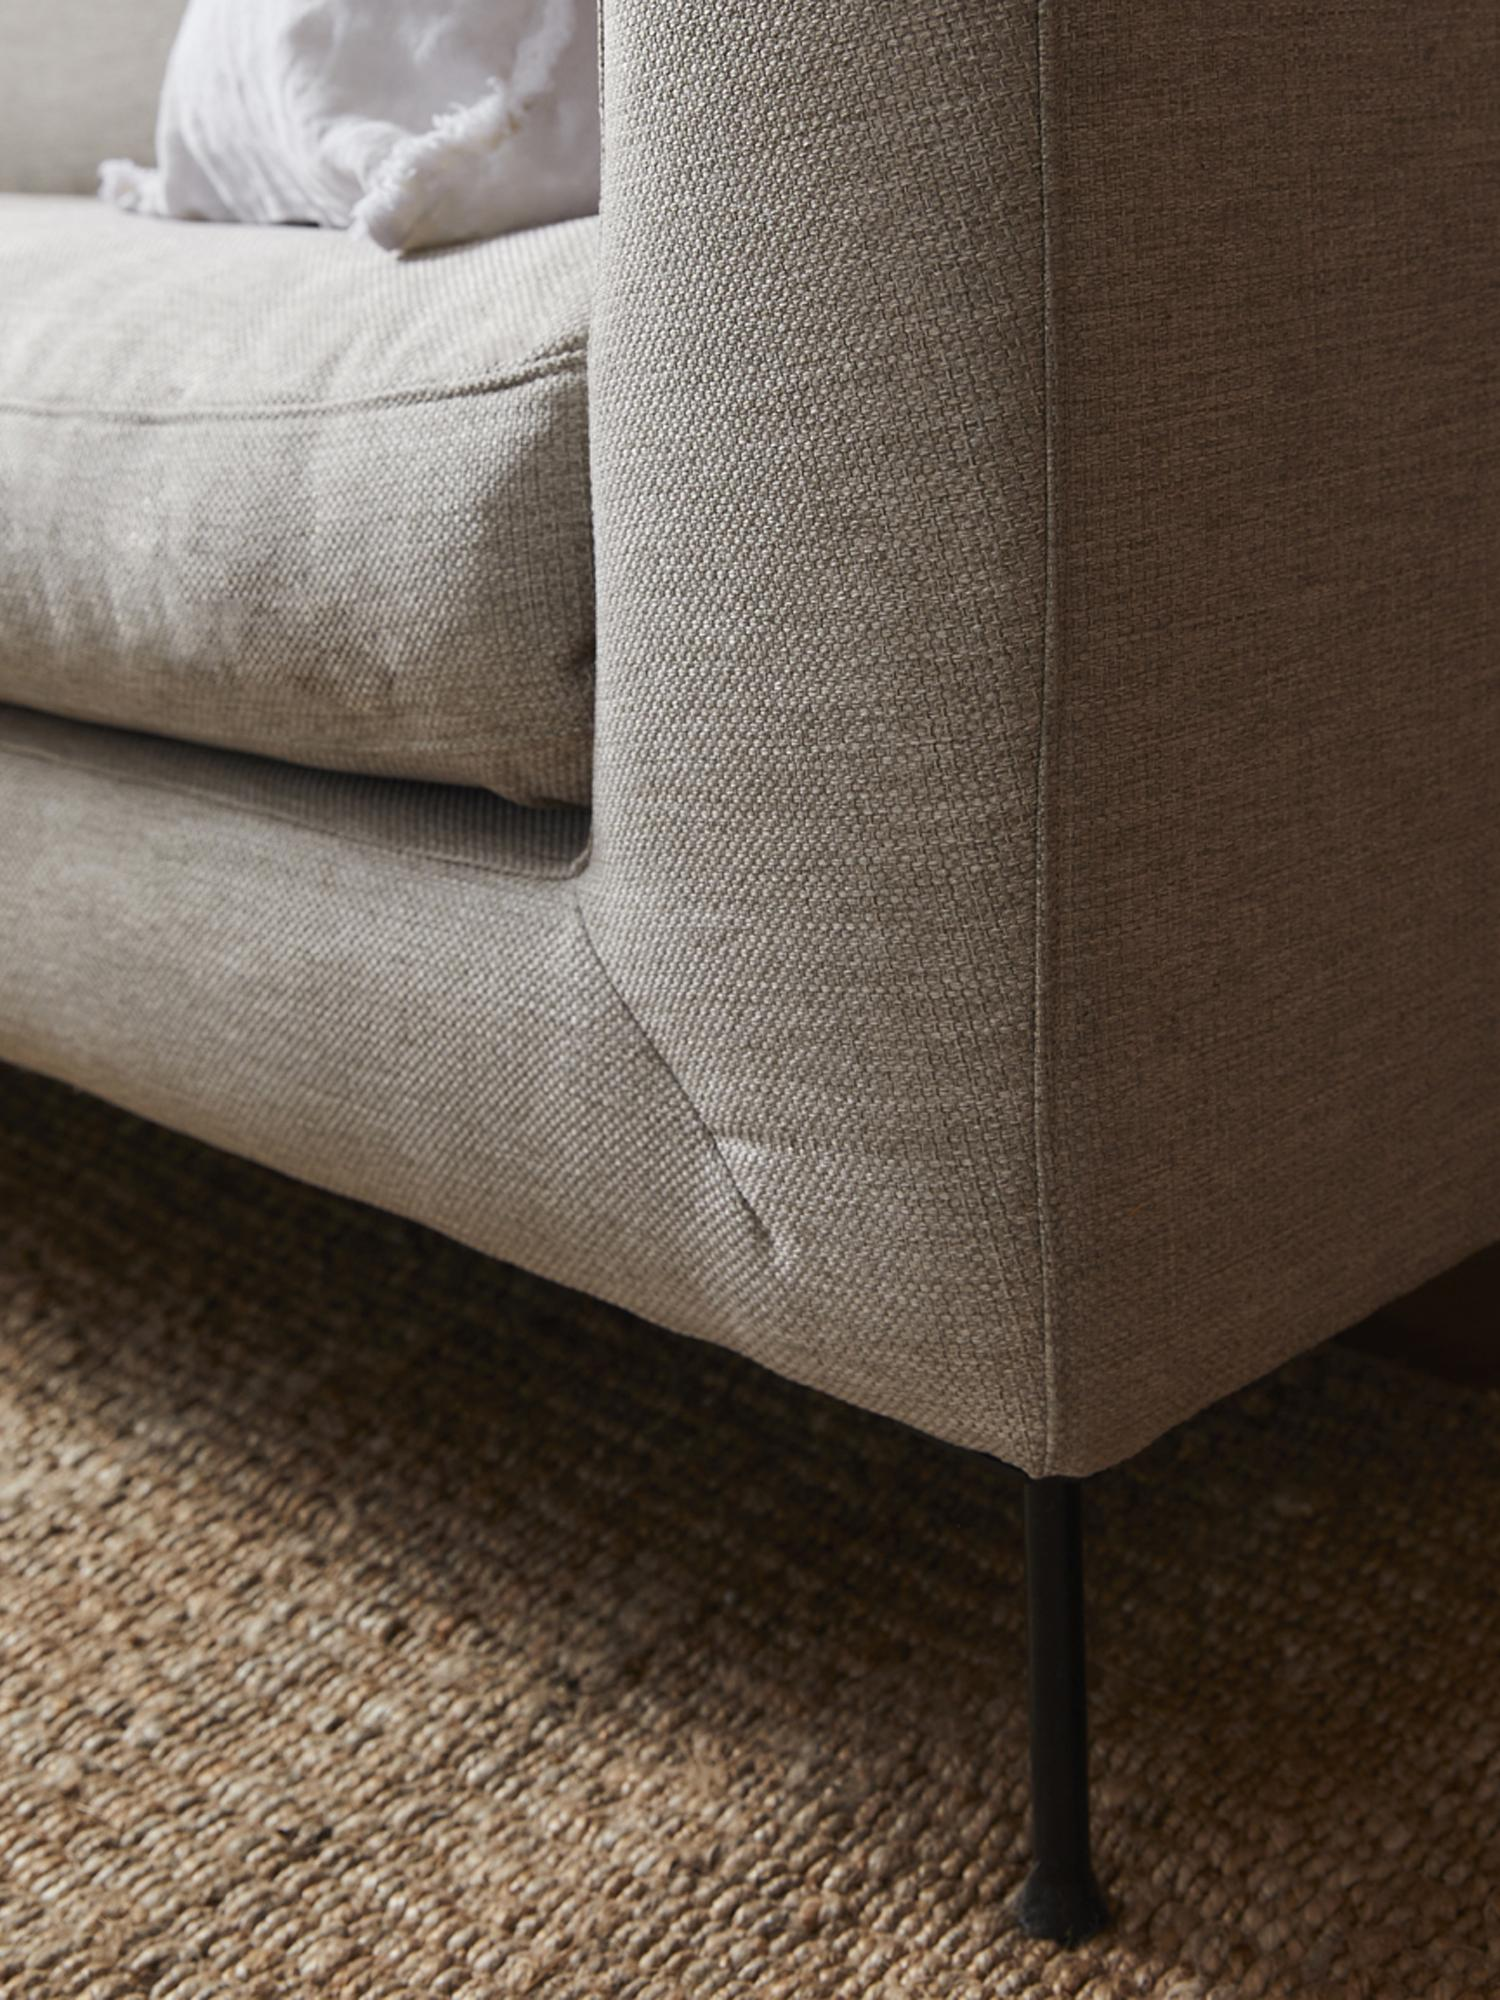 Ecksofa Cucita (3-Sitzer), Bezug: Webstoff (Polyester) Der , Gestell: Massives Kiefernholz, Füße: Metall, lackiert, Webstoff Beige, B 262 x T 163 cm